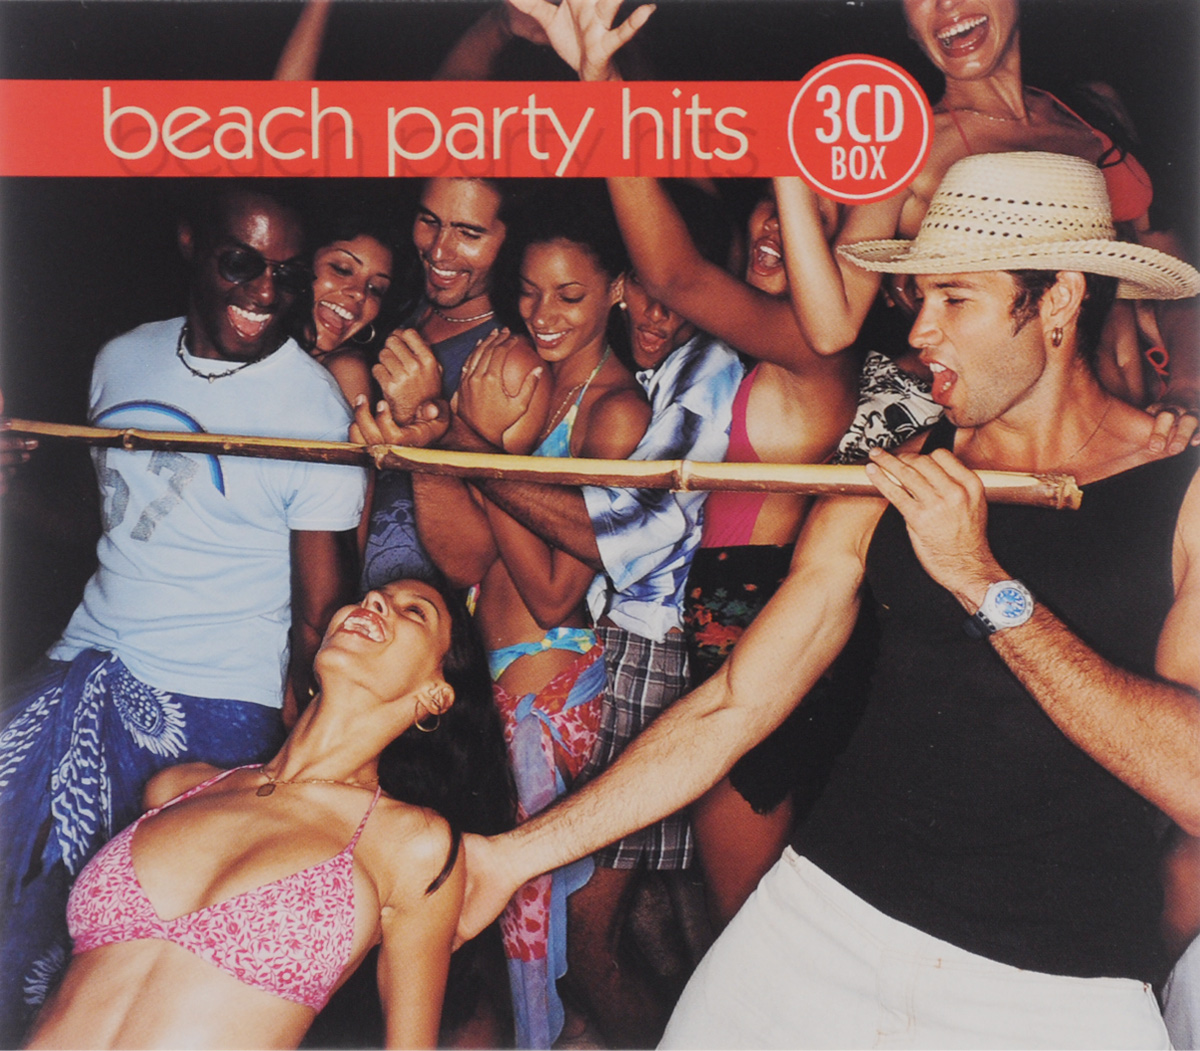 Тина Чарльз,The Blue Chips,Tricky Girls,Jump & Joy!,3t,Karmah,In-Grid,Carrilio,Франческо Наполи,Beach Bumpers,Inner Feeling,Дженнифер Лопес,Марсель Романов,Activate,`CoColoCo`,Марга Дредд,TNN,24th Street,`Los Piranas`,Sunflash,Da Copa Kids,Reggae-Esque,Justine Earp,Уолтер Нита,Джесси Грин Beach Party Hits (3 CD) видеоигра для ps4 just dance 2018